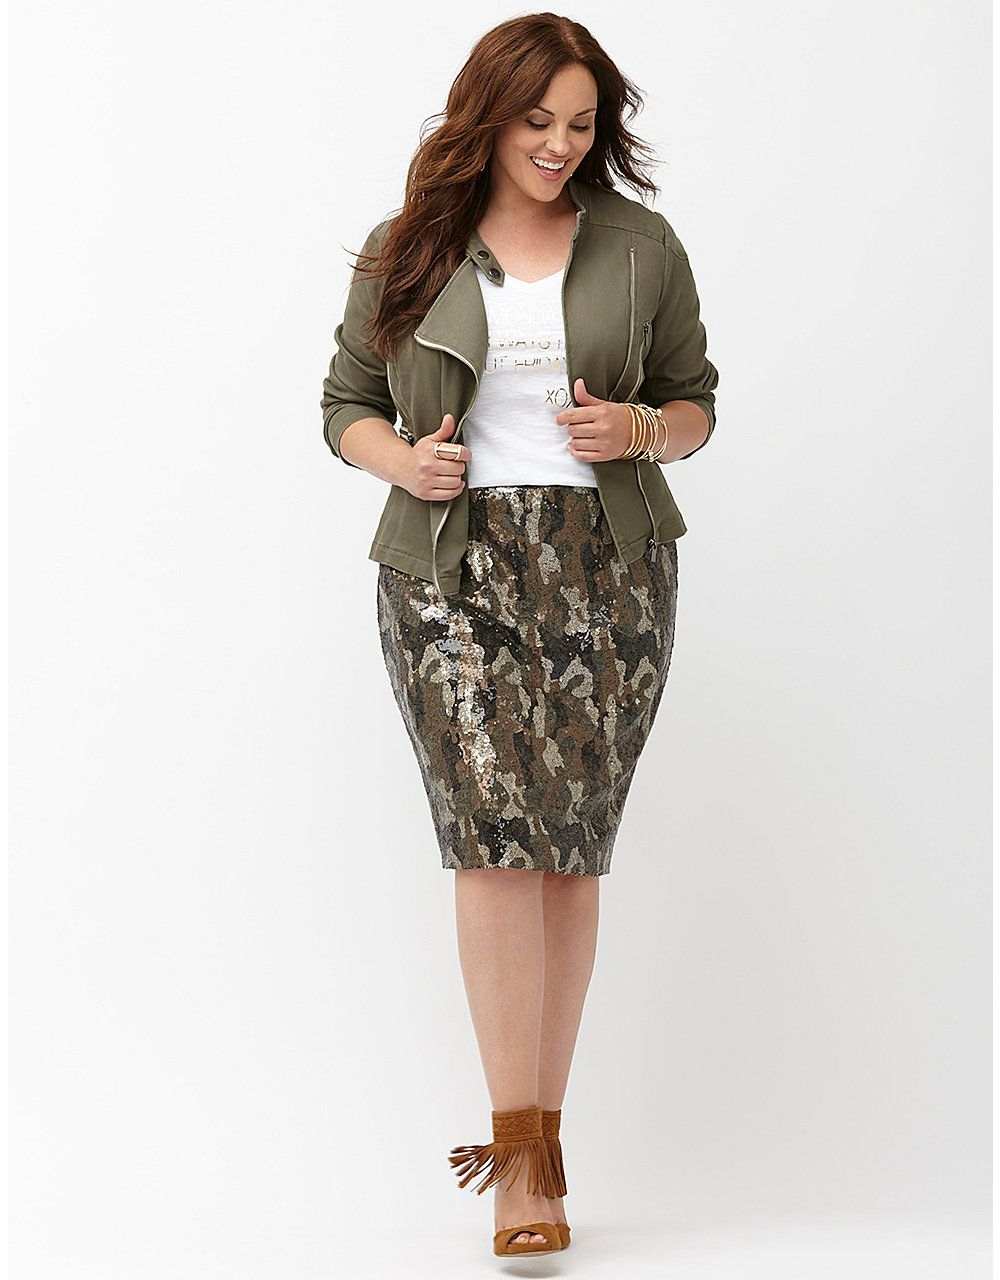 9941eeefc43 Sequin camo pencil skirt by Lane Bryant